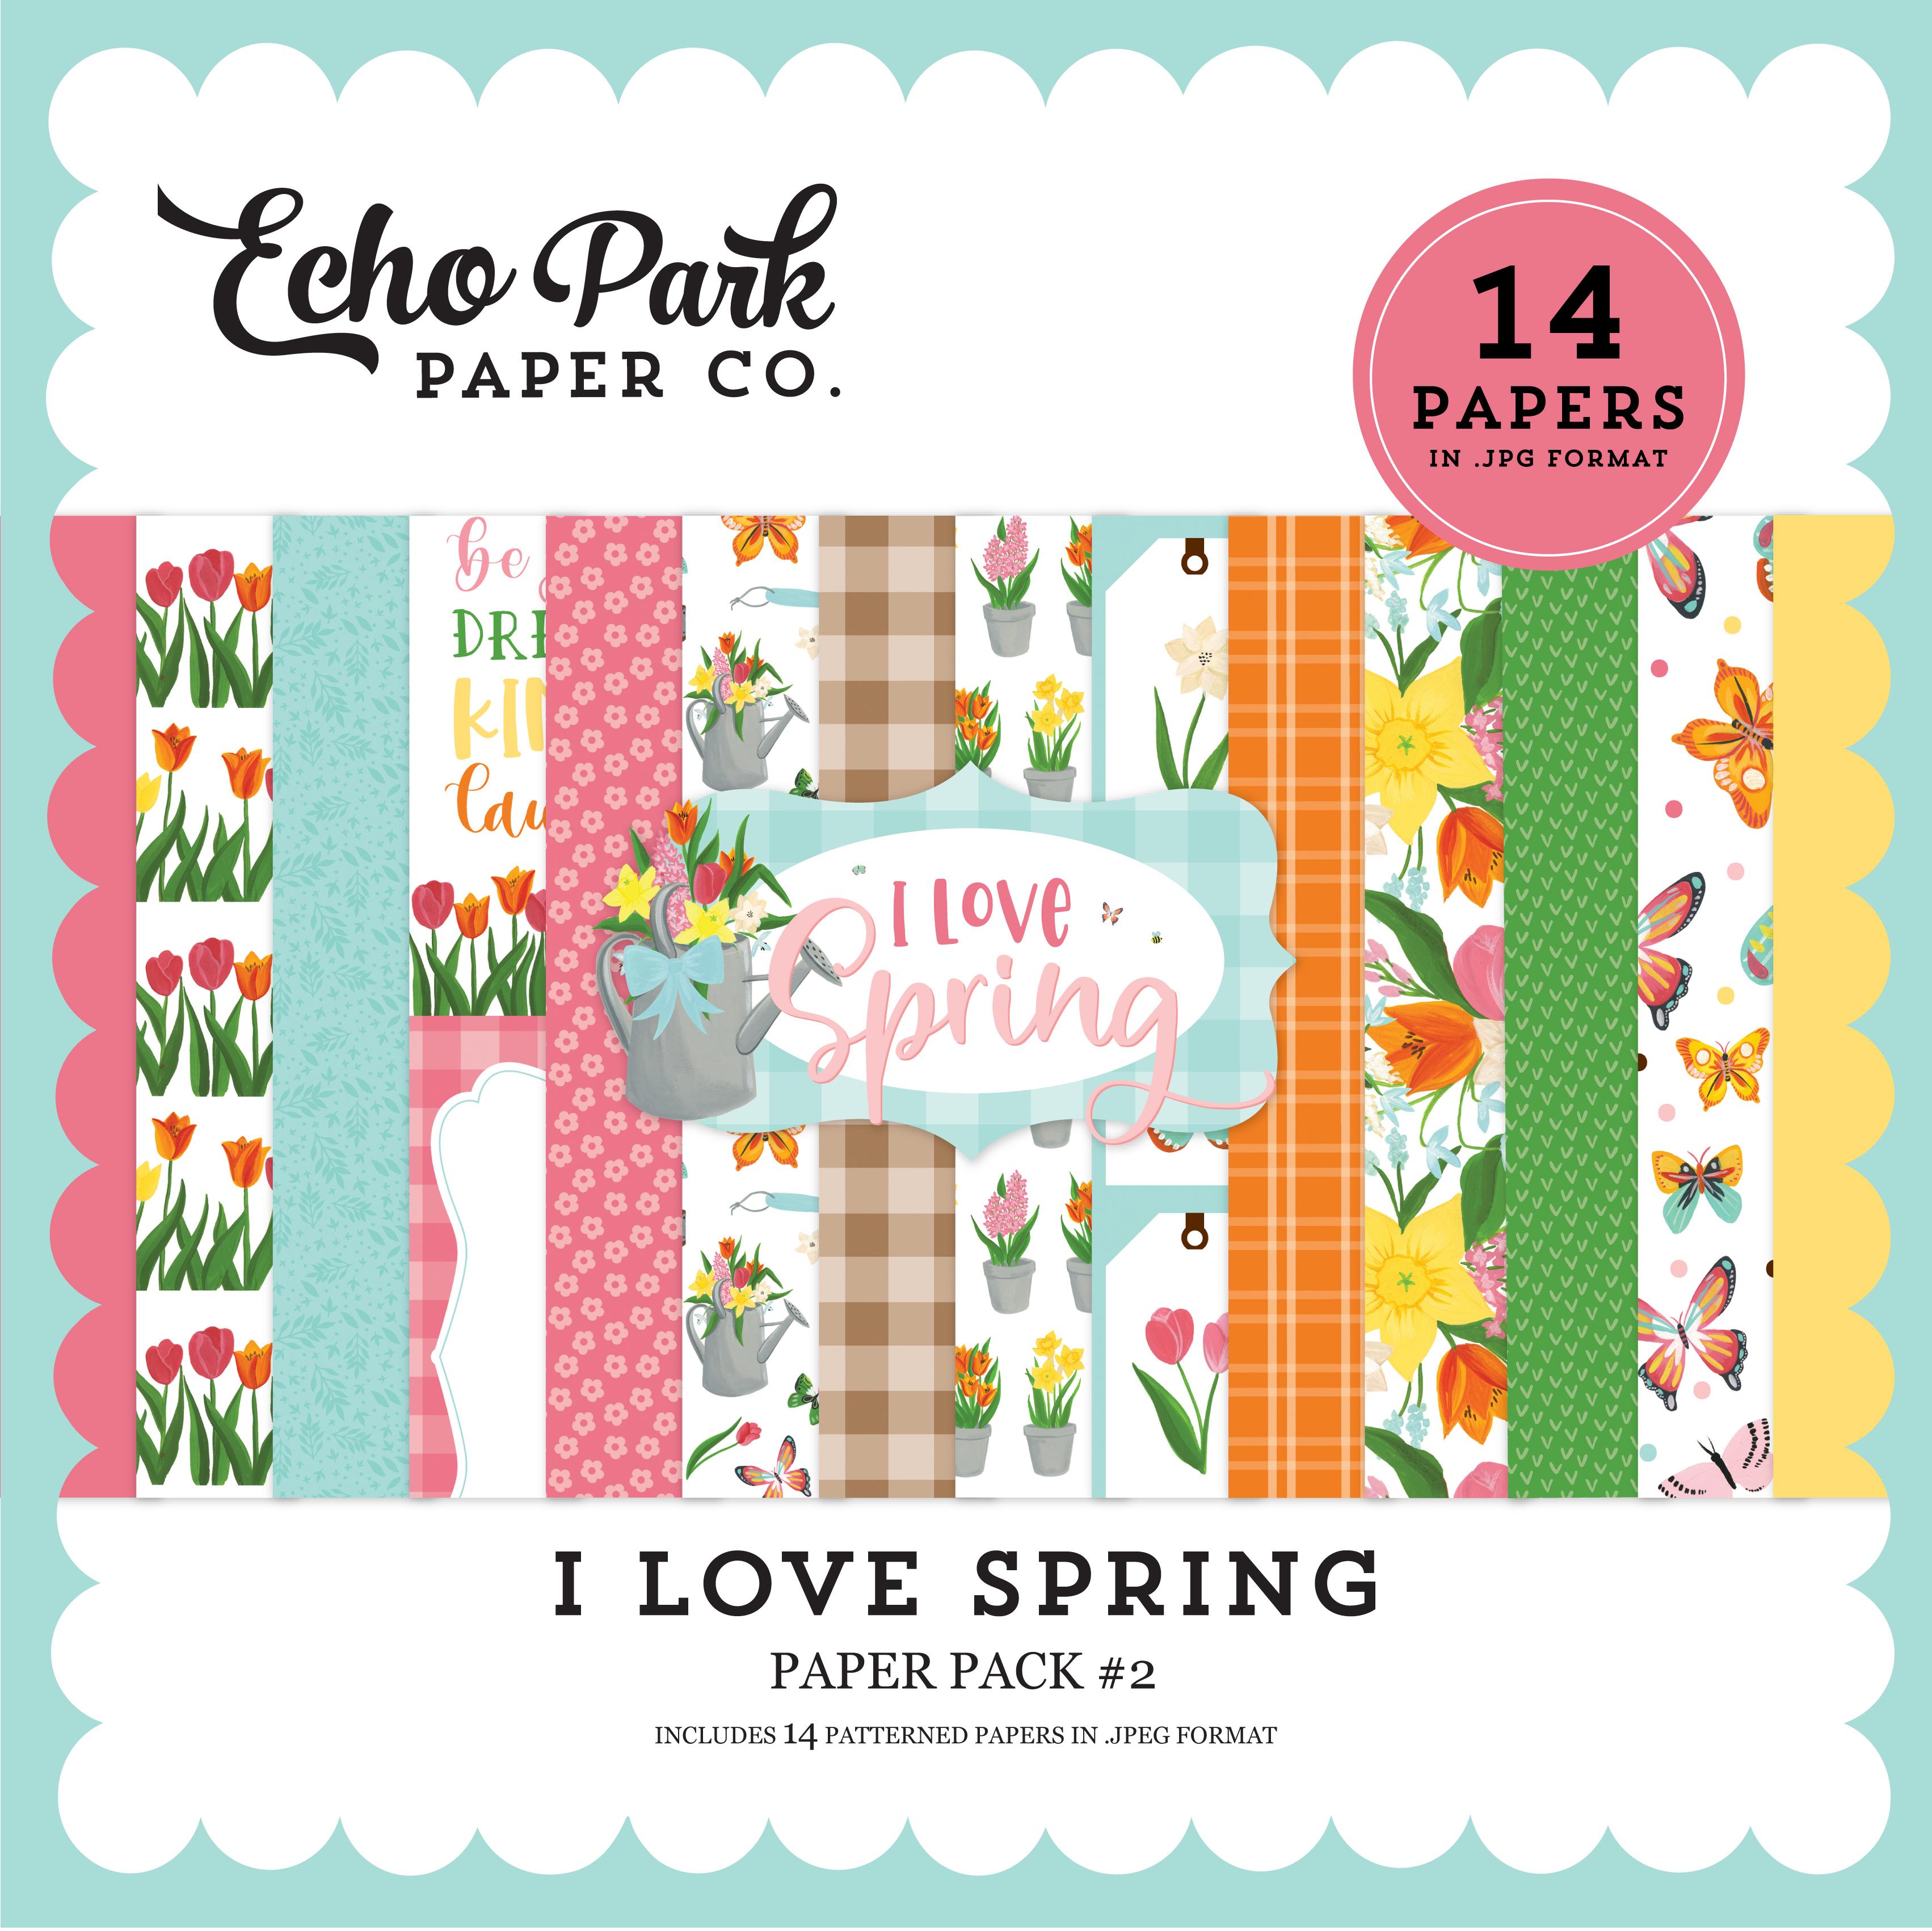 I Love Spring Paper Pack #2